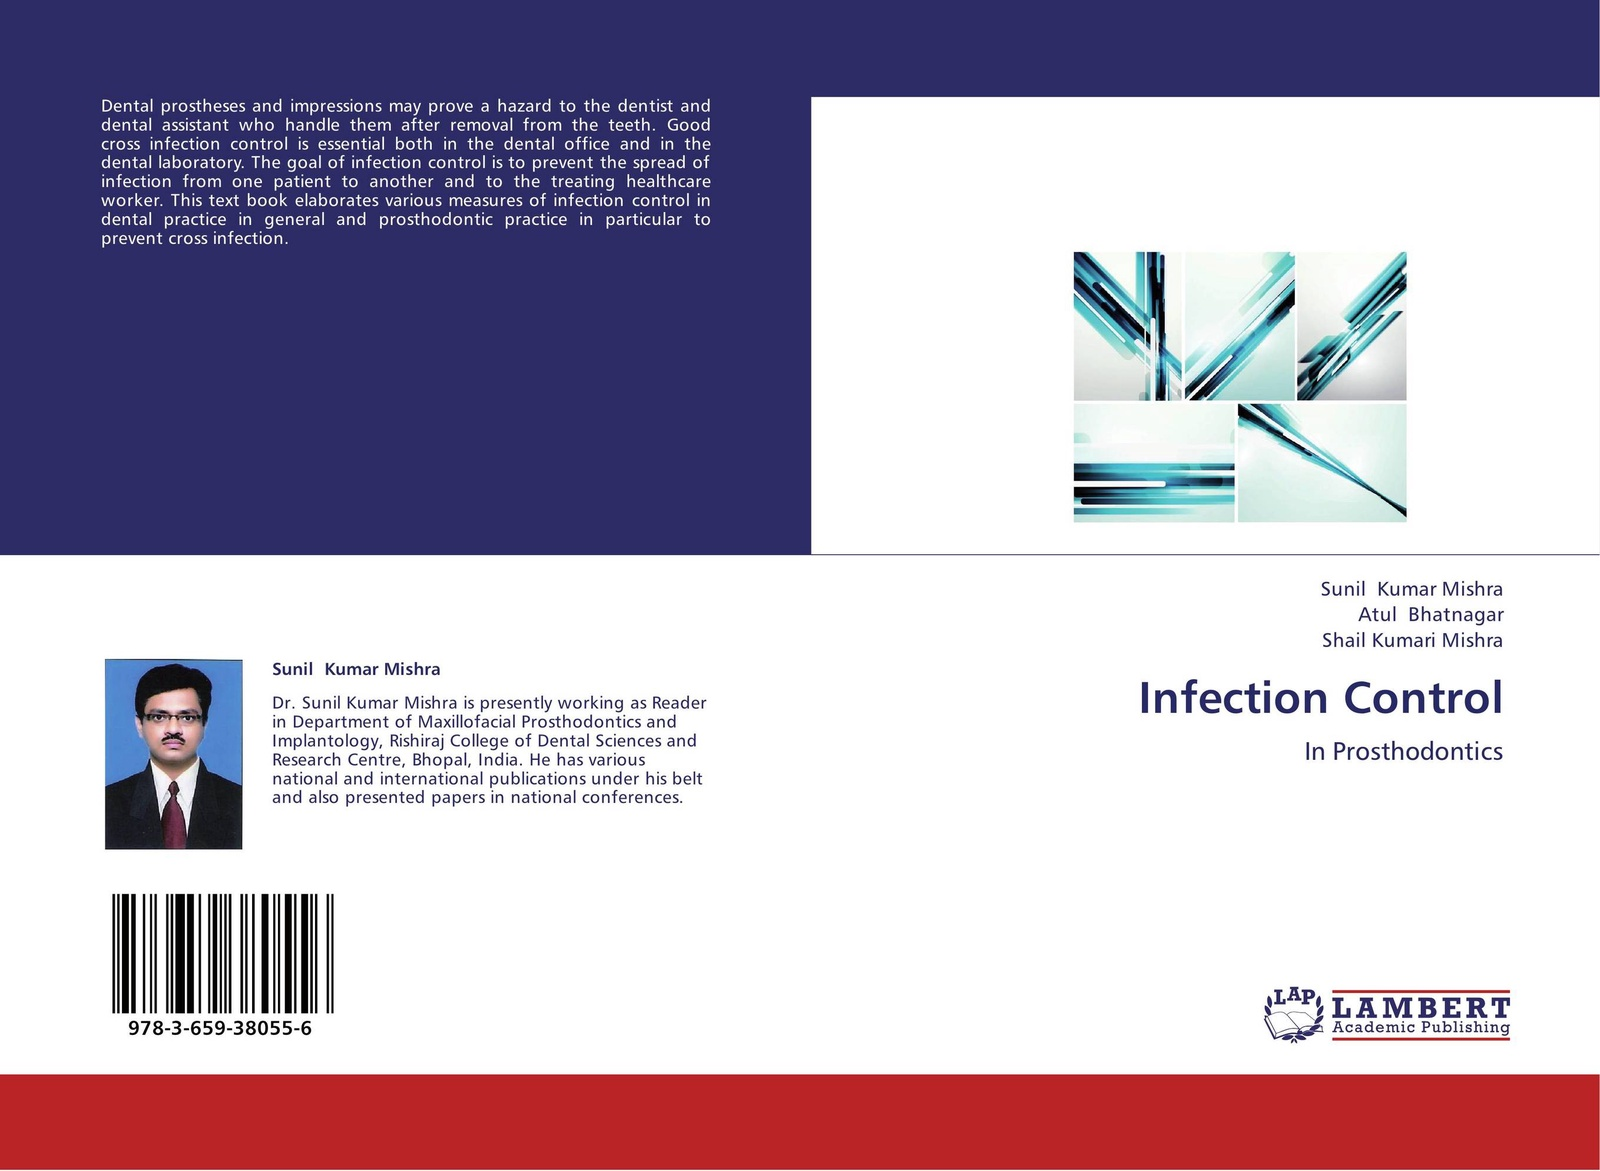 Sunil Kumar Mishra,Atul Bhatnagar and Shail Kumari Mishra Infection Control недорого